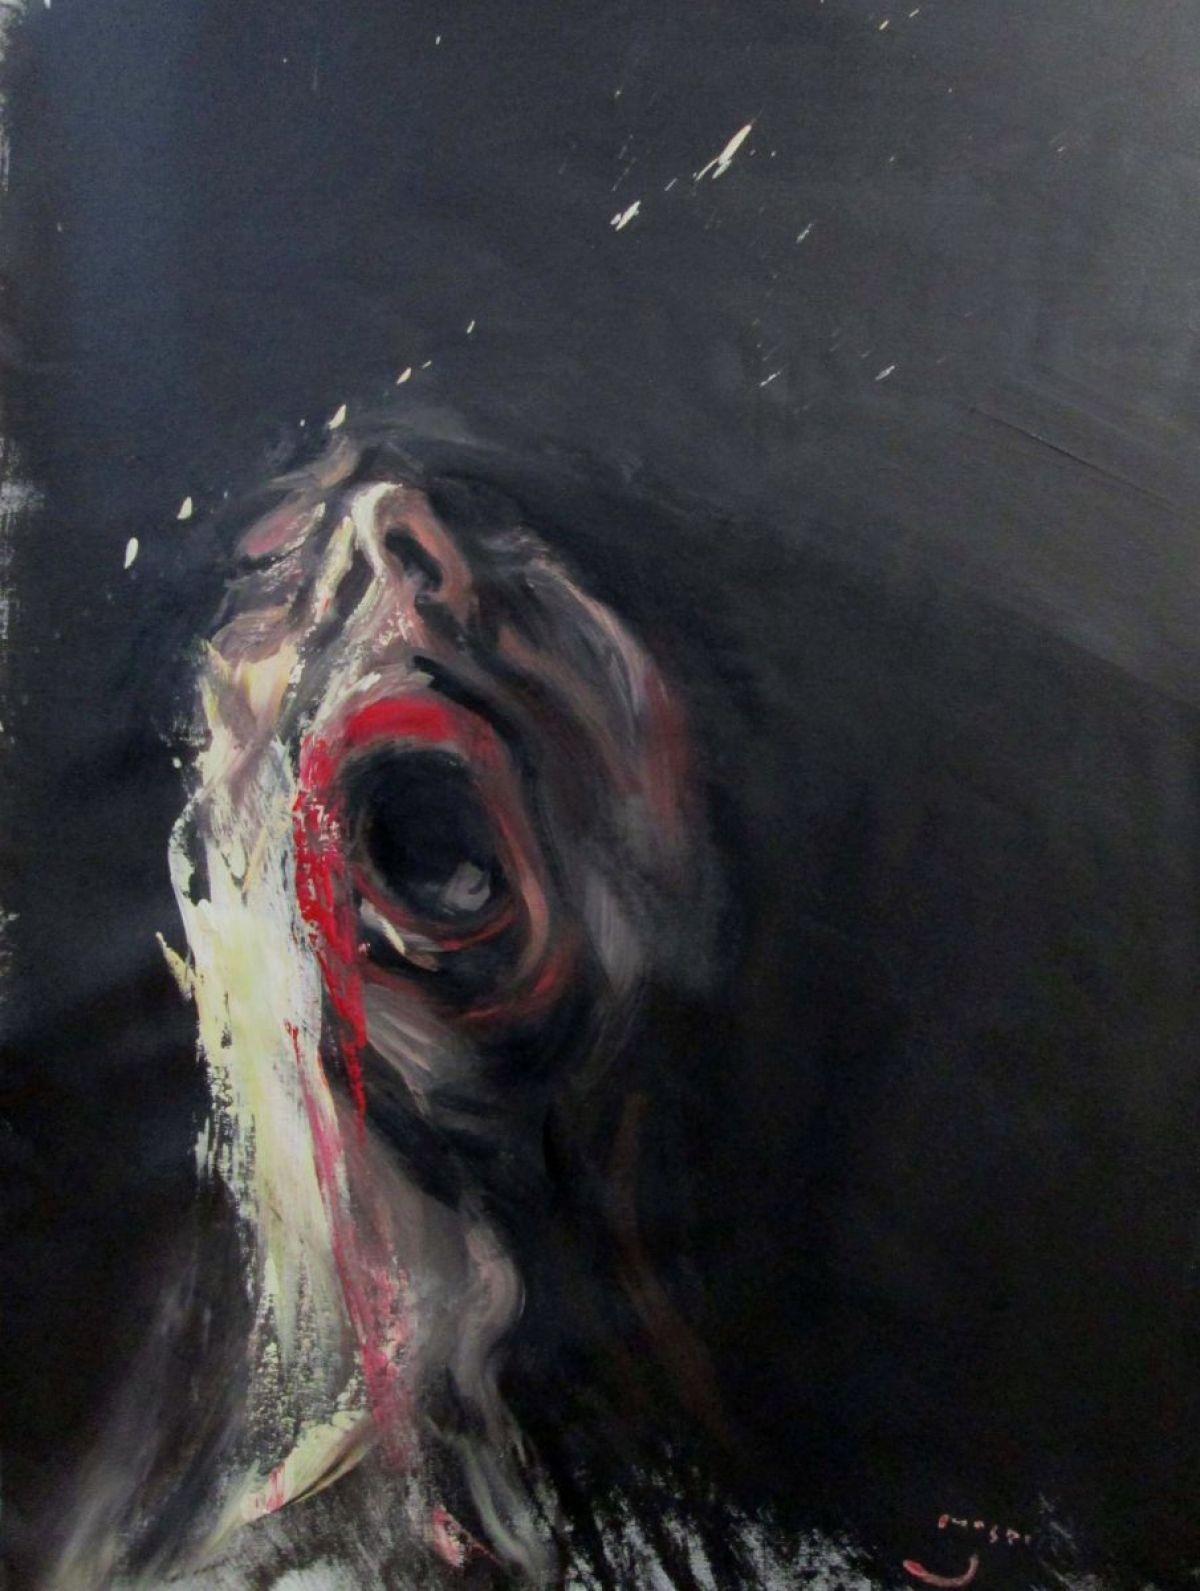 Masri Hayssam - Screaming#22 -Syria series, 2013